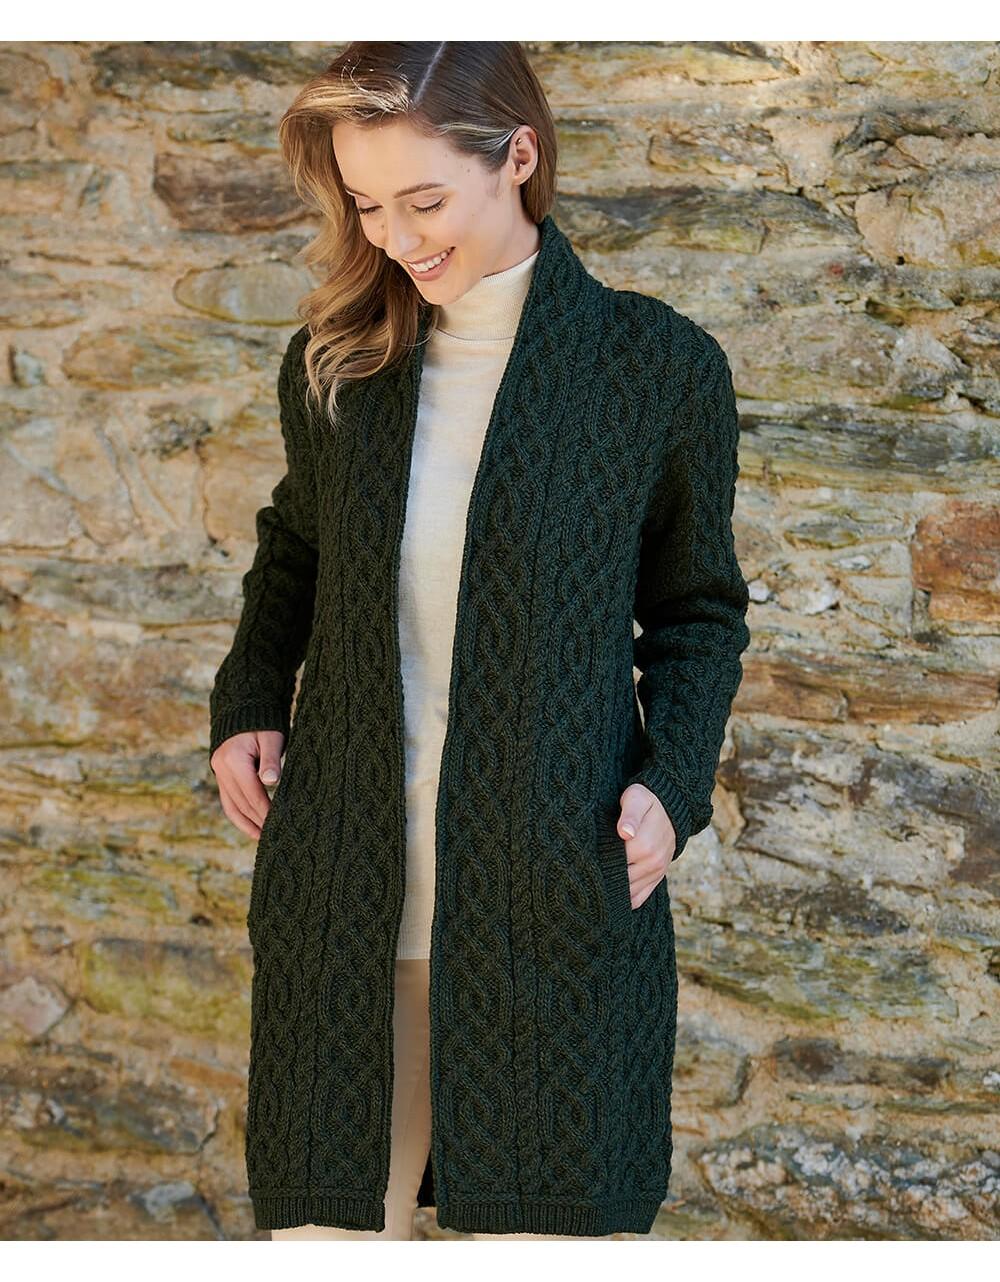 Aran Knit Edge To Edge Coat With Celtic Braid|Aran Cardigans|Irish Handcrafts -1